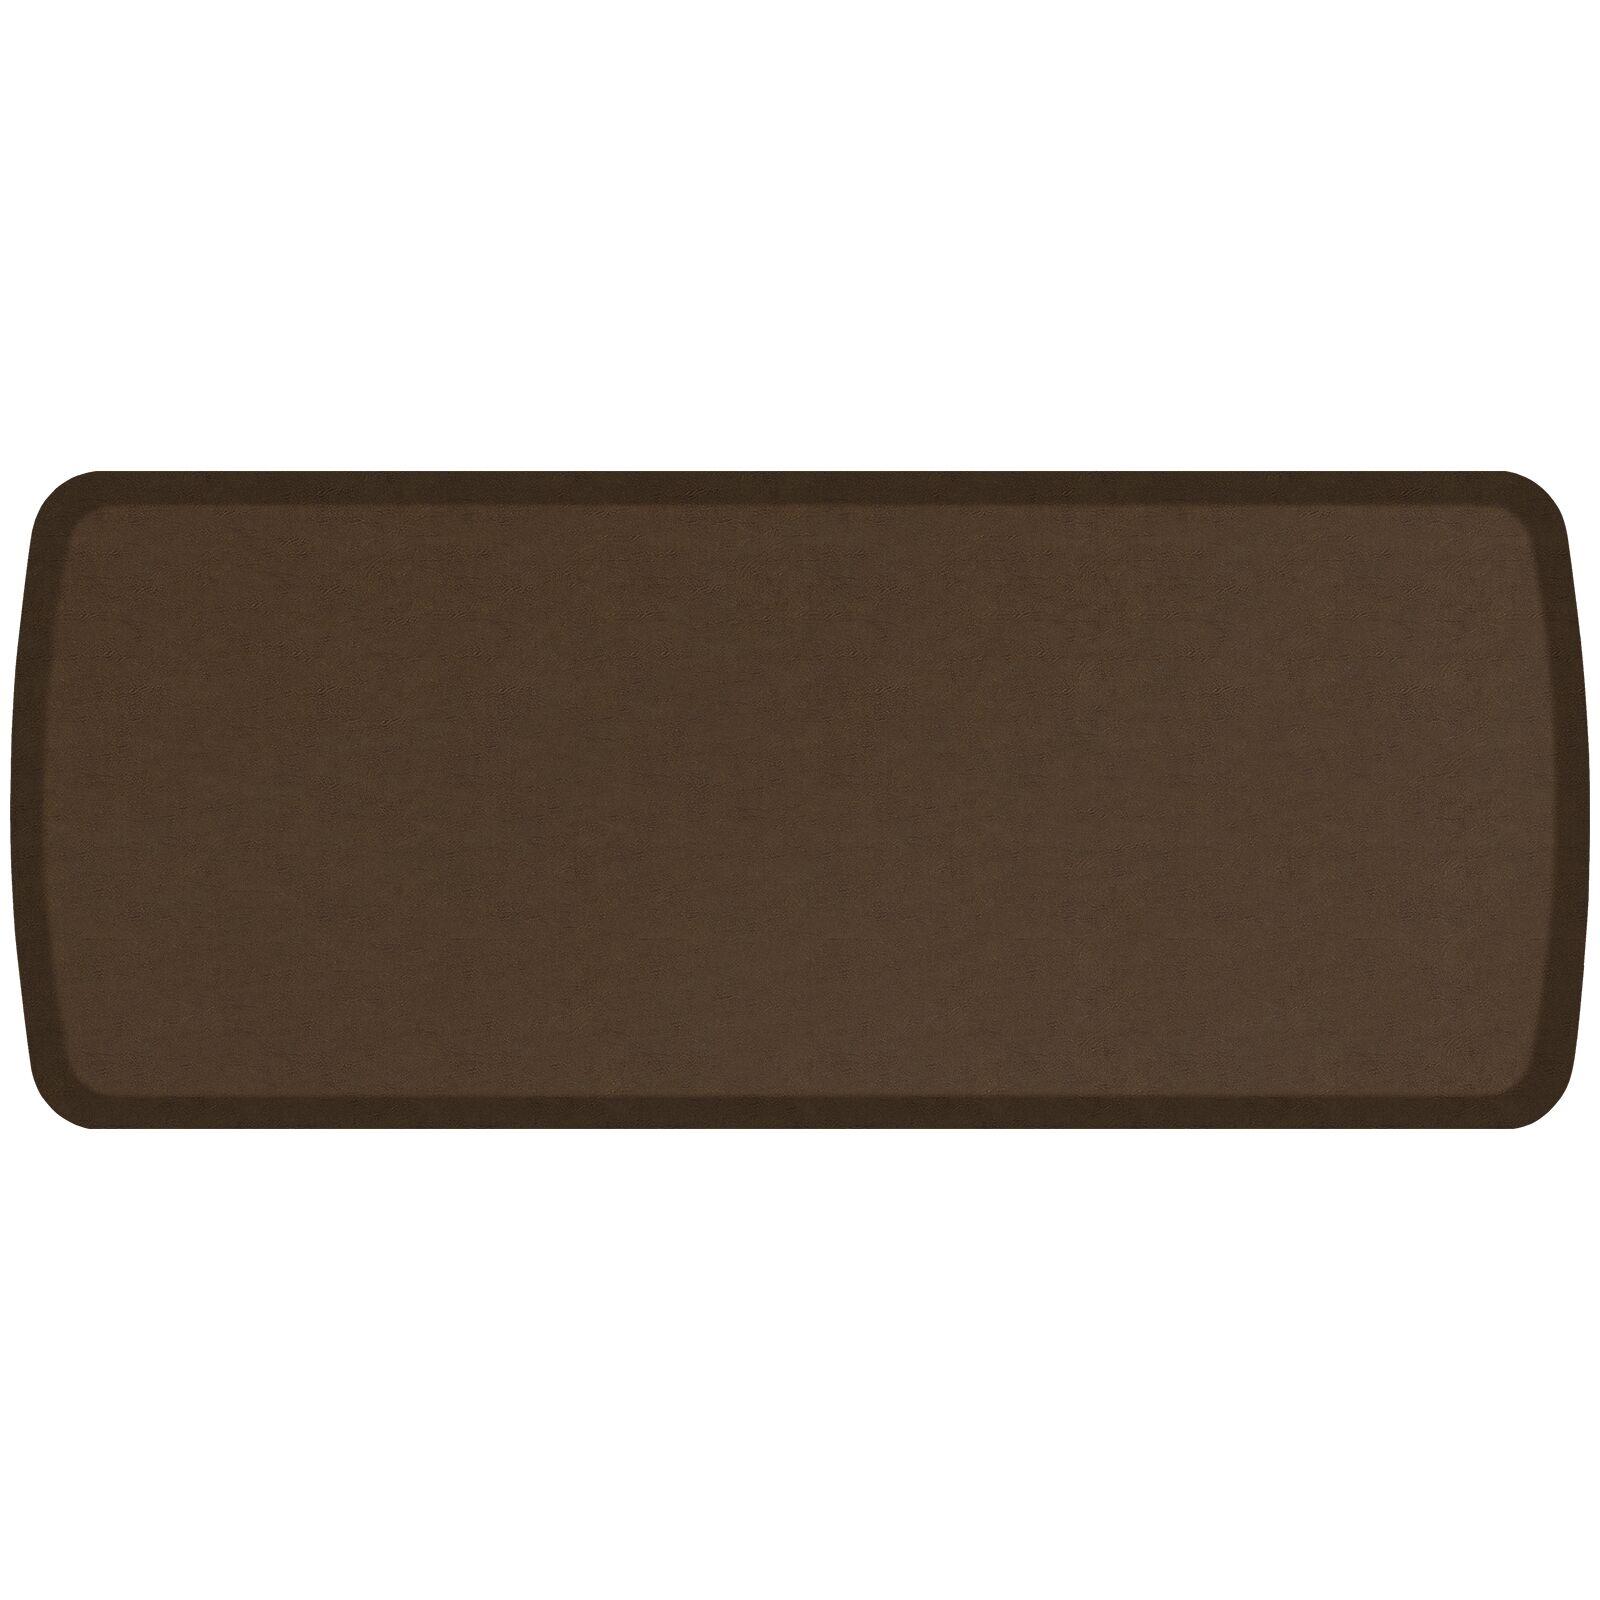 Vintage Leather Elite Premier Comfort Kitchen Mat Mat Size: 1'8